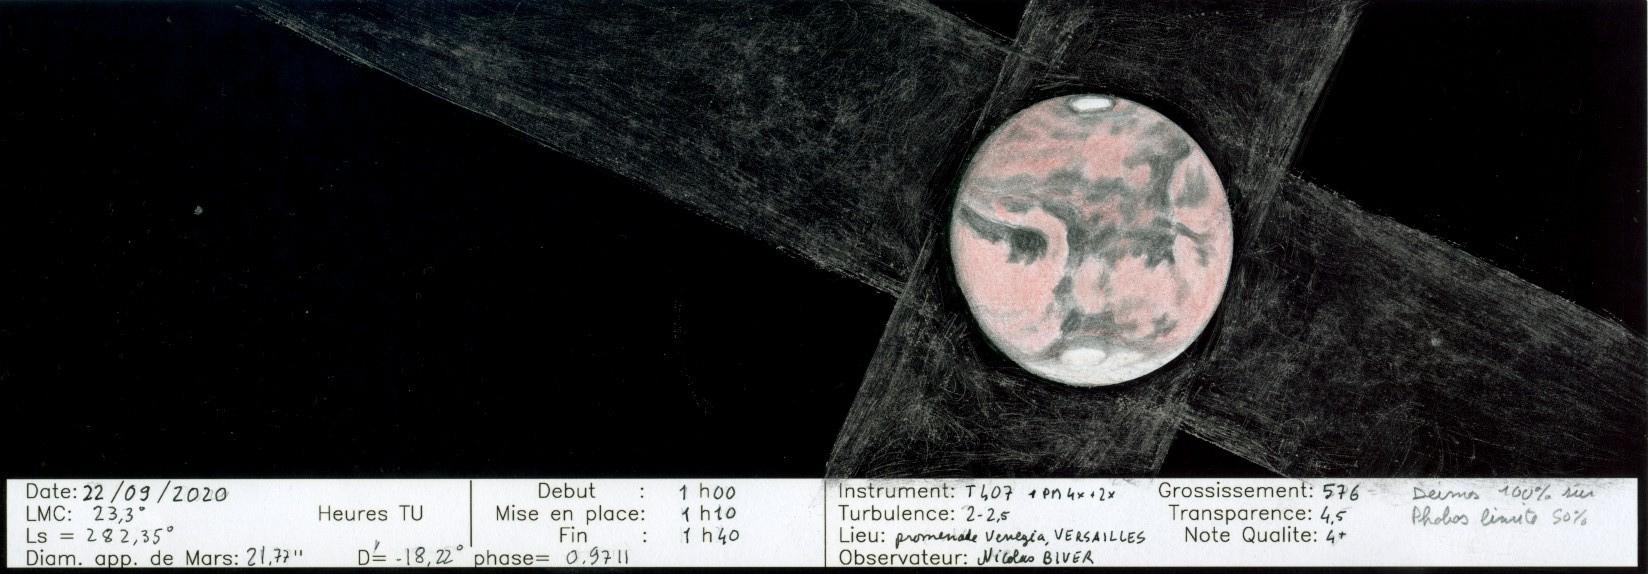 mars-sat220920.jpg.46bdd71e7f03eb35009501a41e1c34ec.jpg